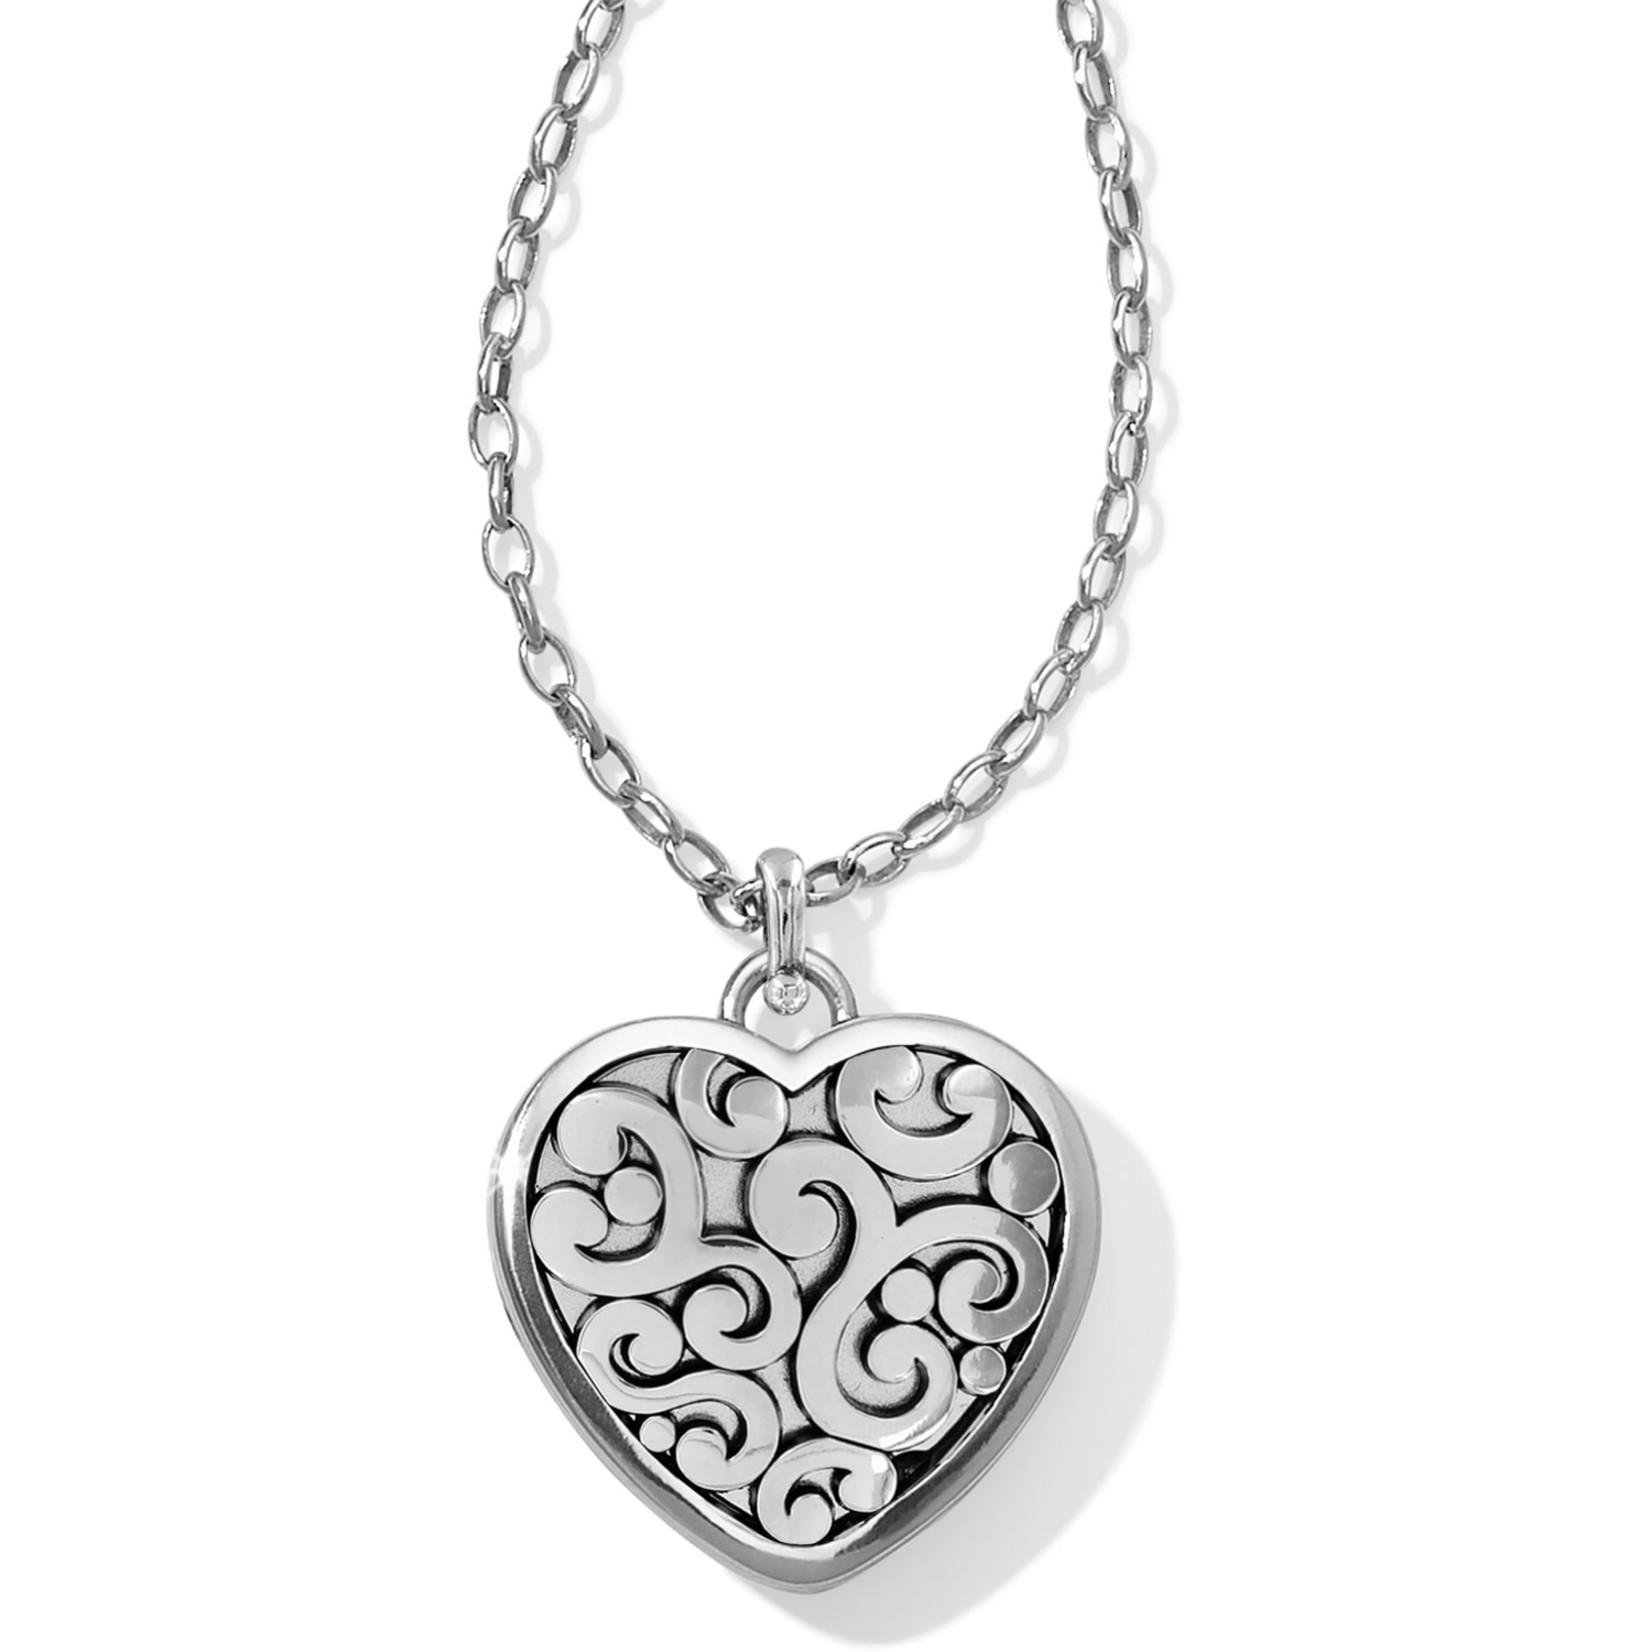 Brighton Contempo Heart Convertible Locket Necklace